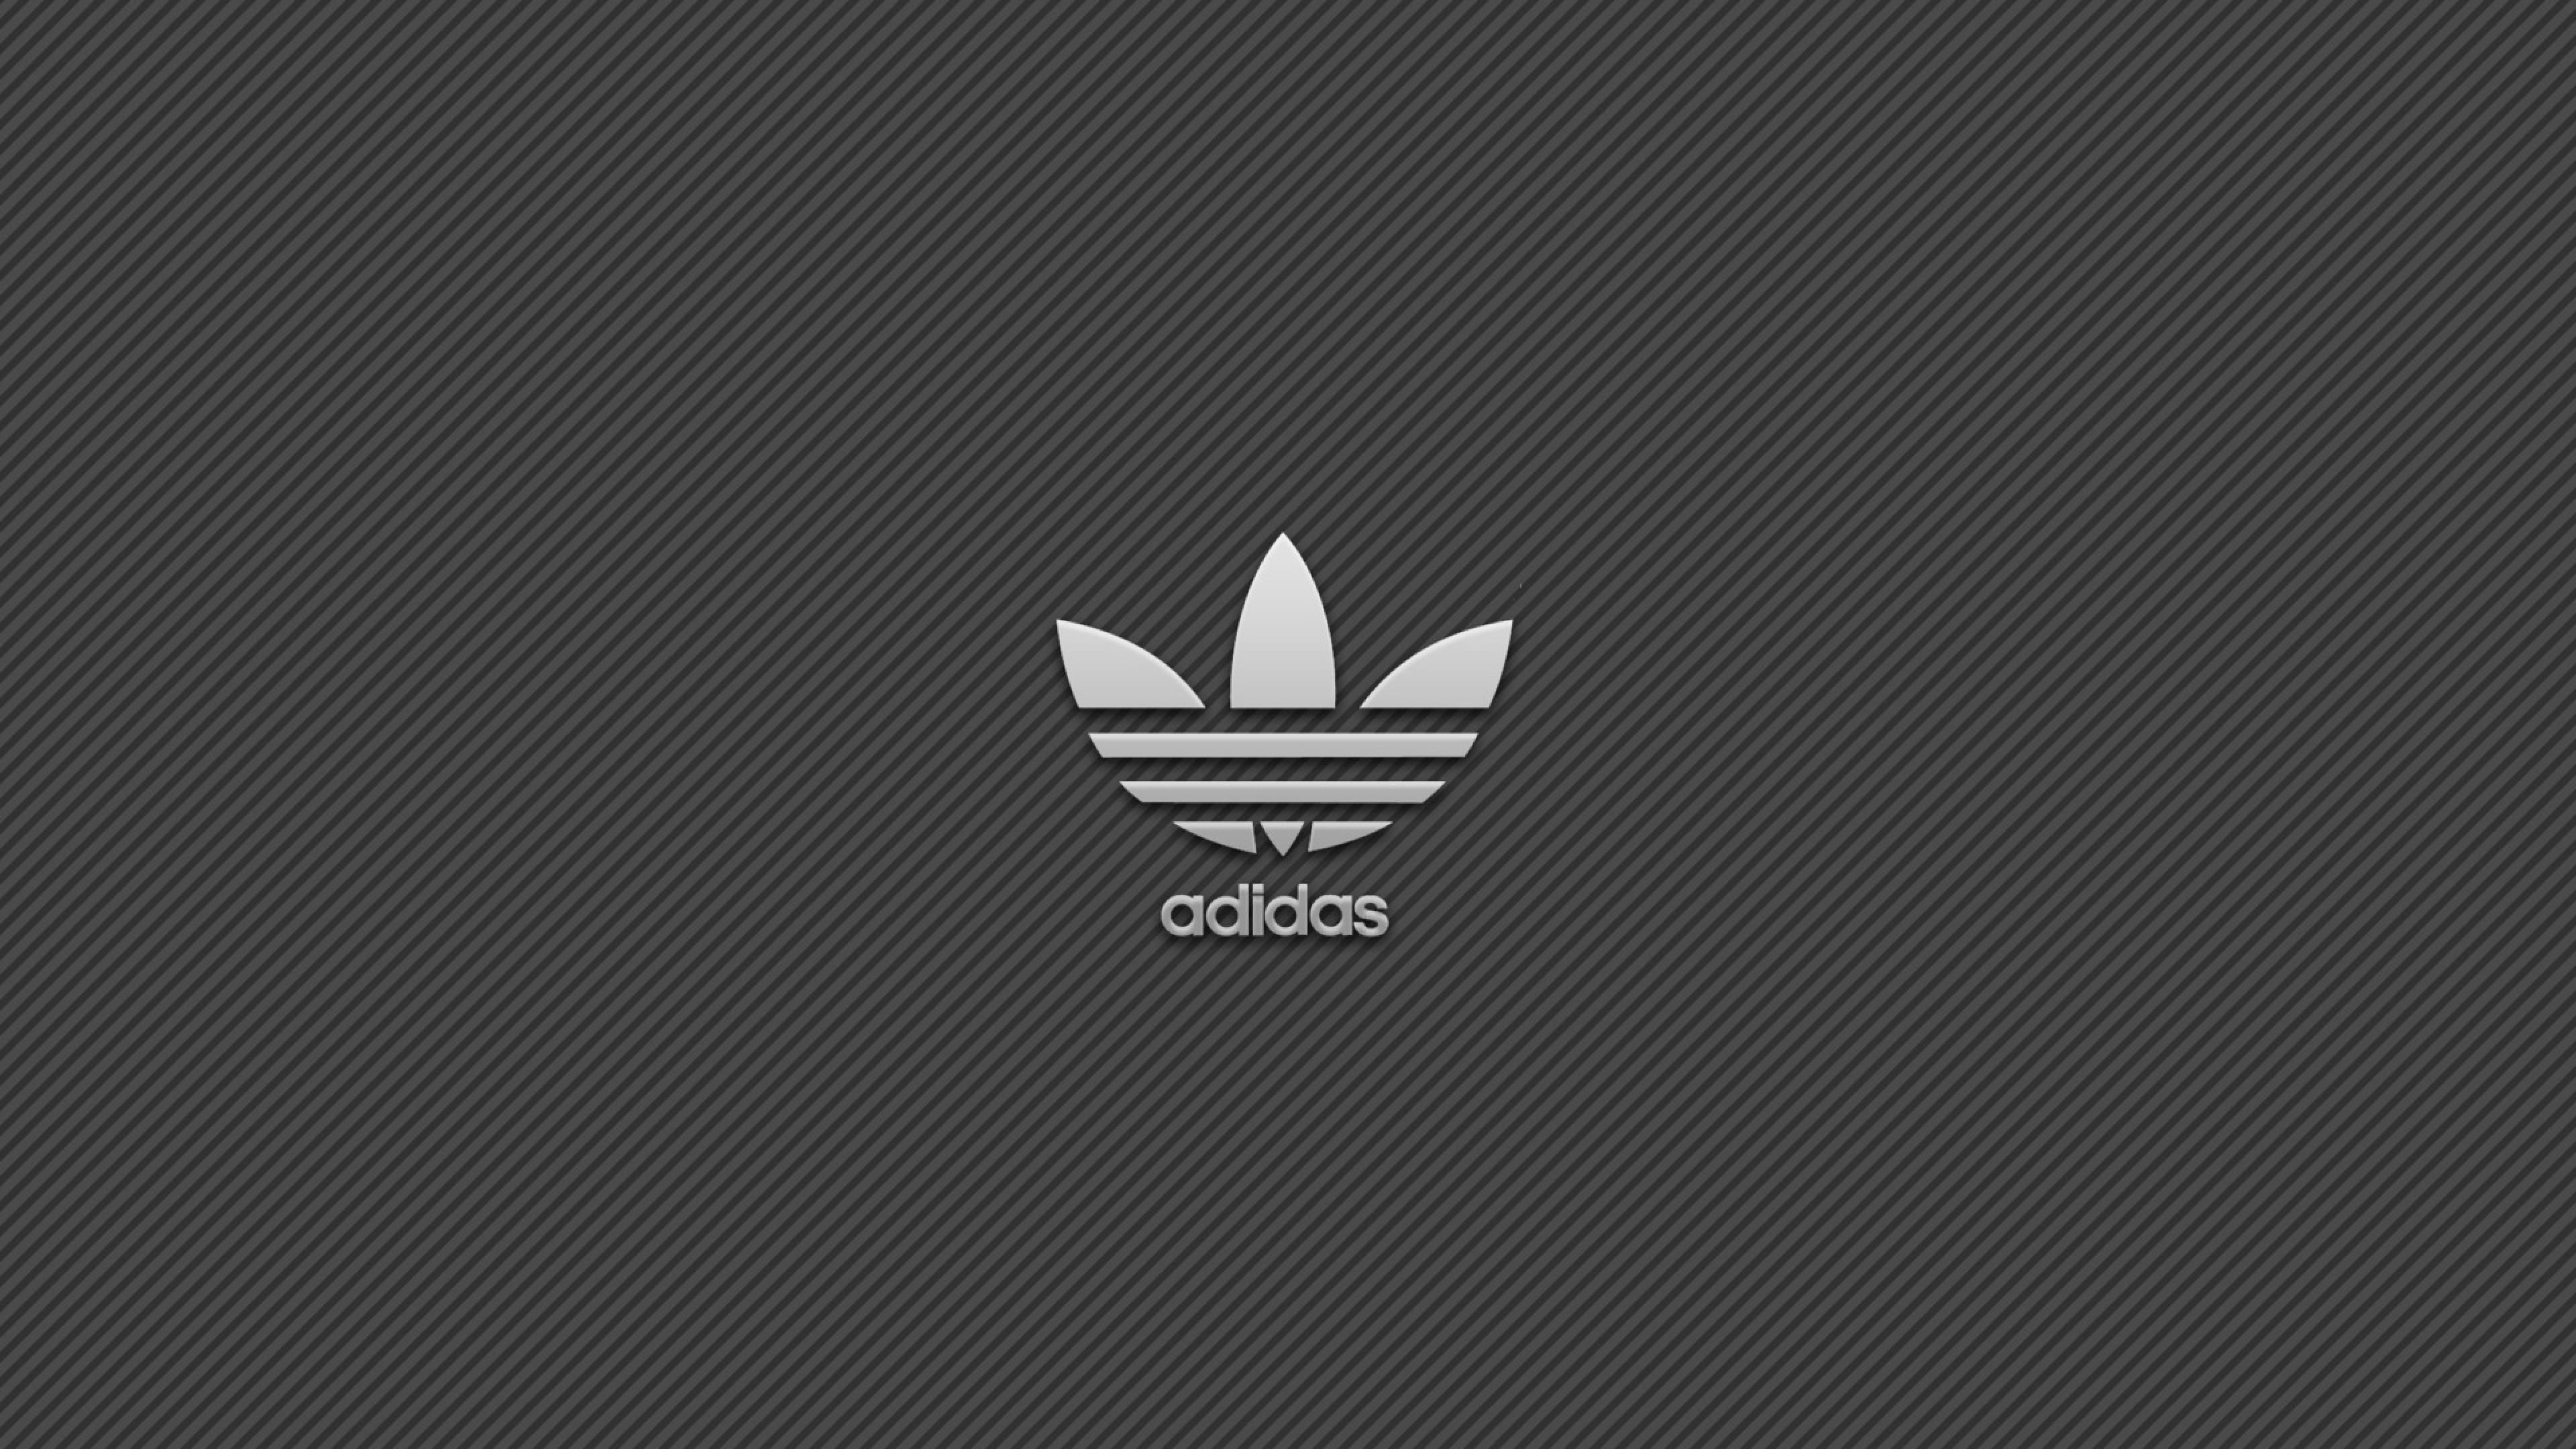 Download Wallpaper 3840x2160 Adidas Brand Logo 4K Ultra 3840x2160